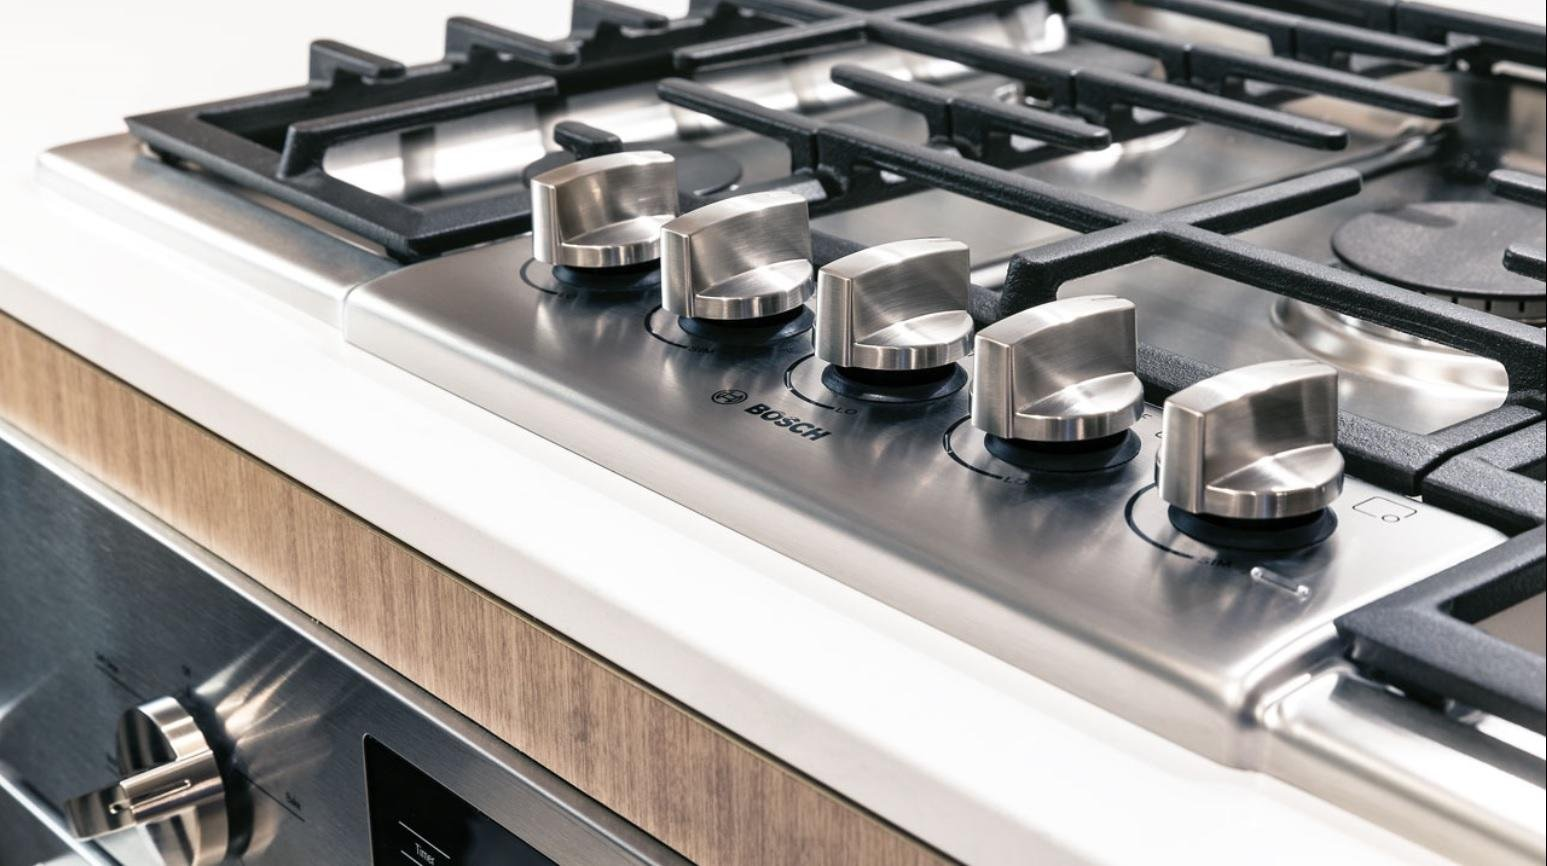 gas stove (JPG)